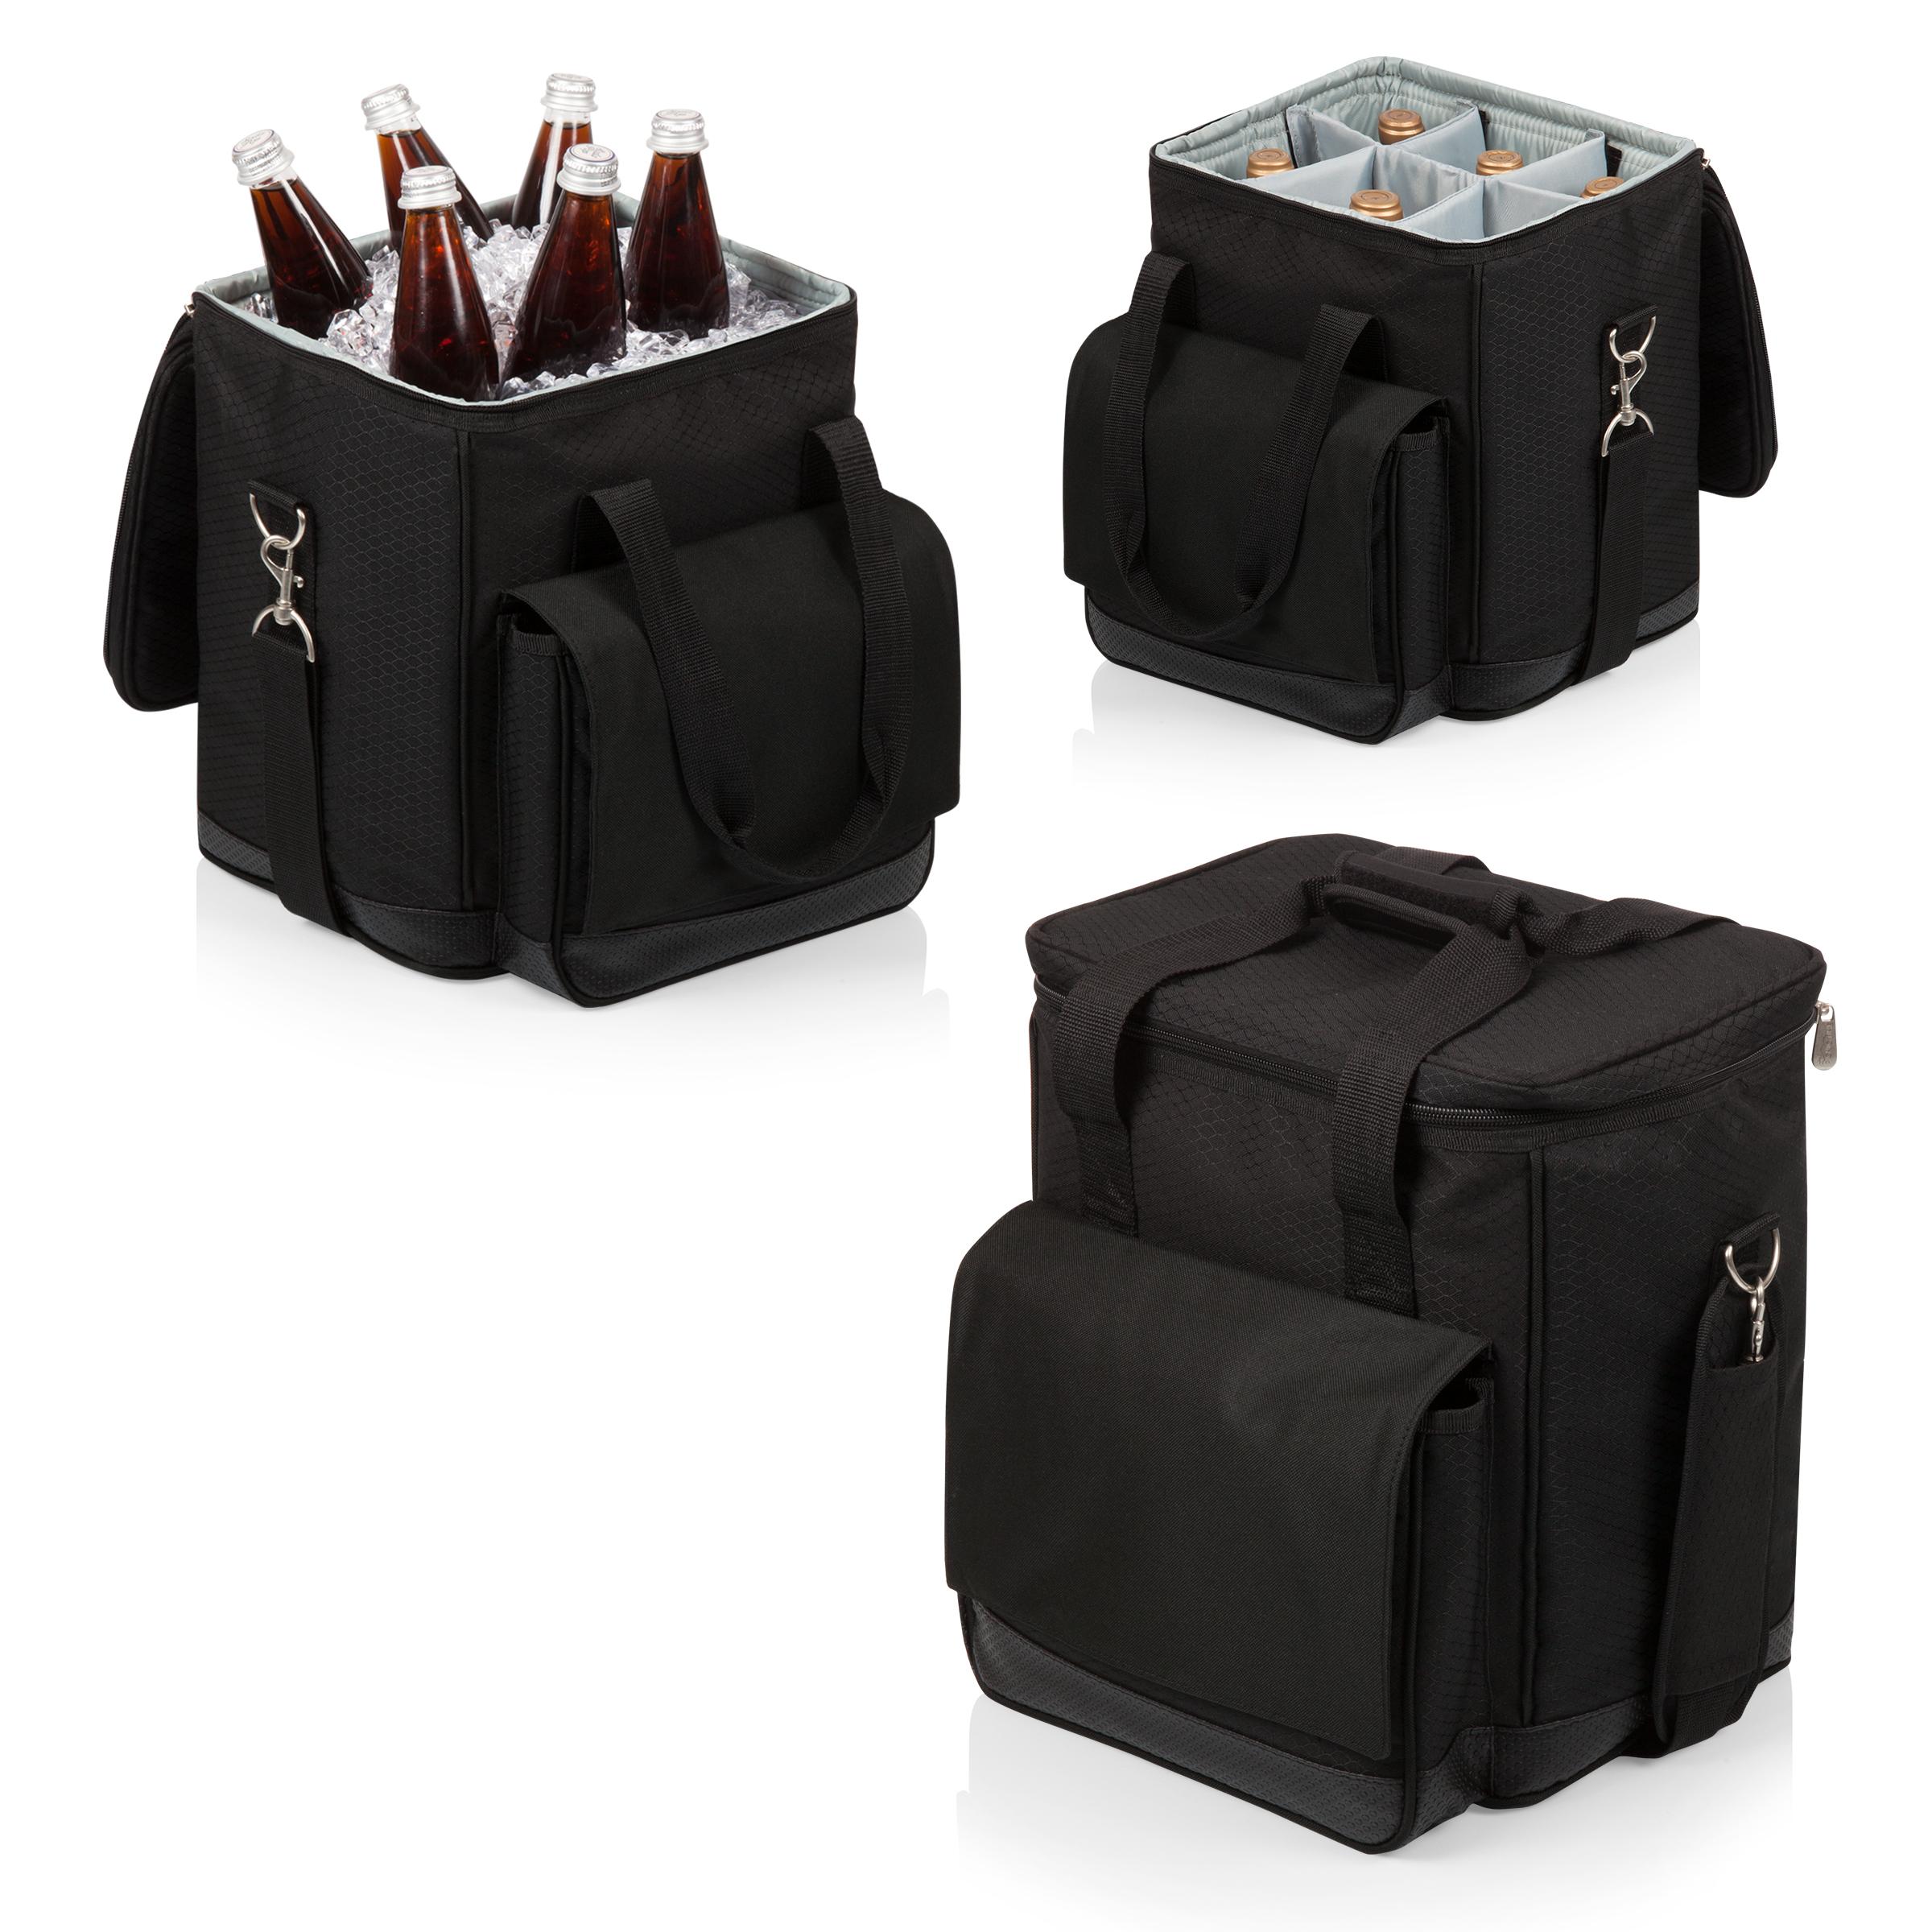 Image of Picnic Time Cellar 6-Bottle Wine Carrier & Cooler Tote- Black